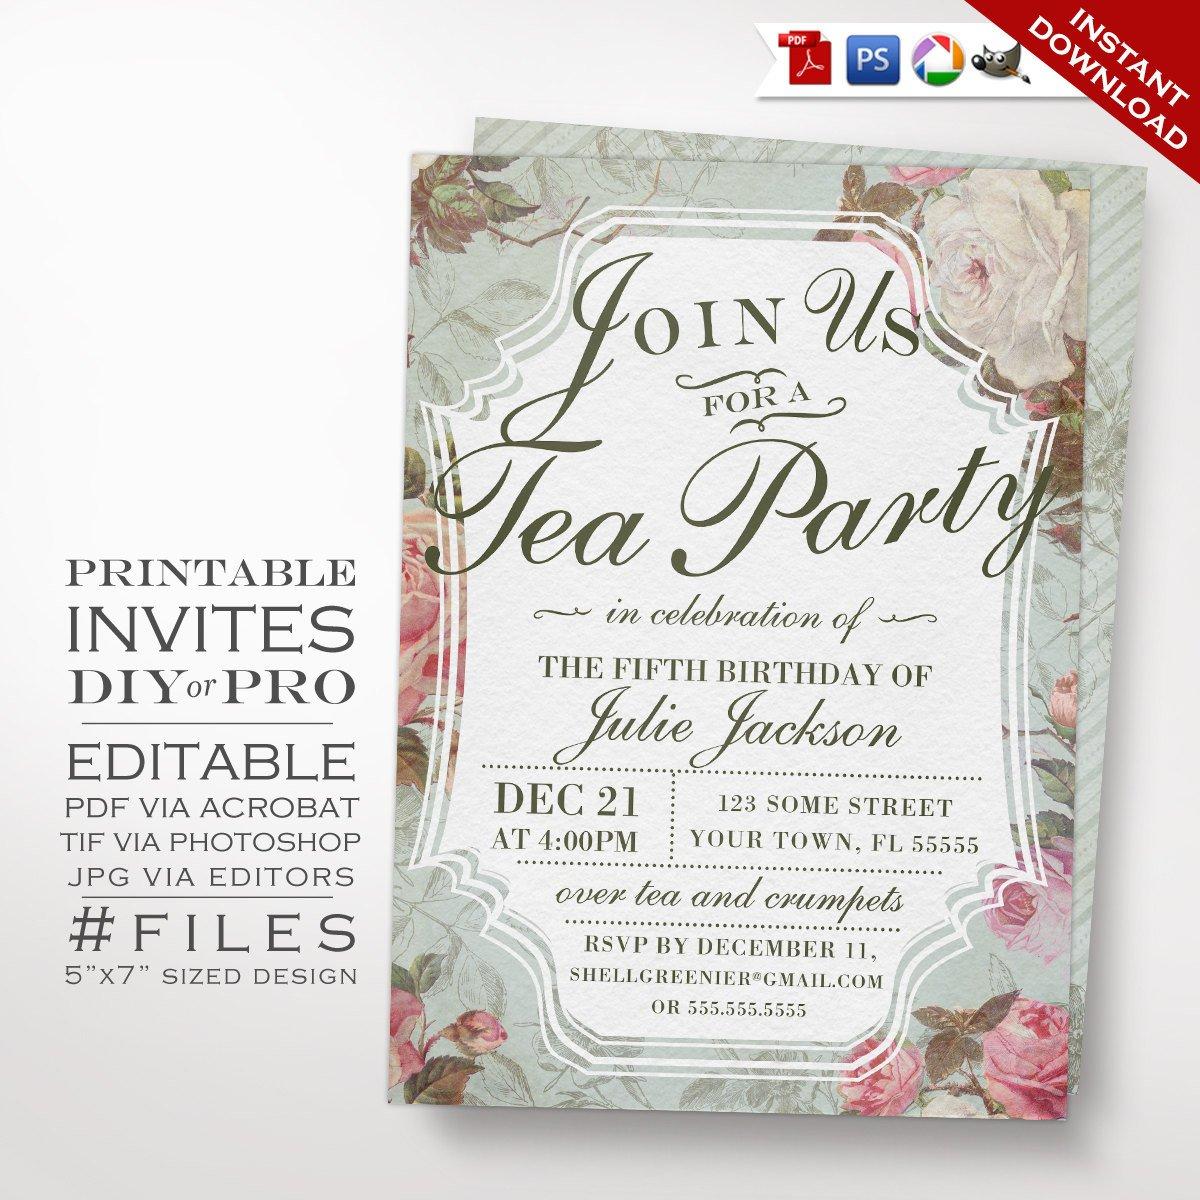 Tea Party Invitations Templates Birthday Tea Party Invitation Template Vintage Rose Tea